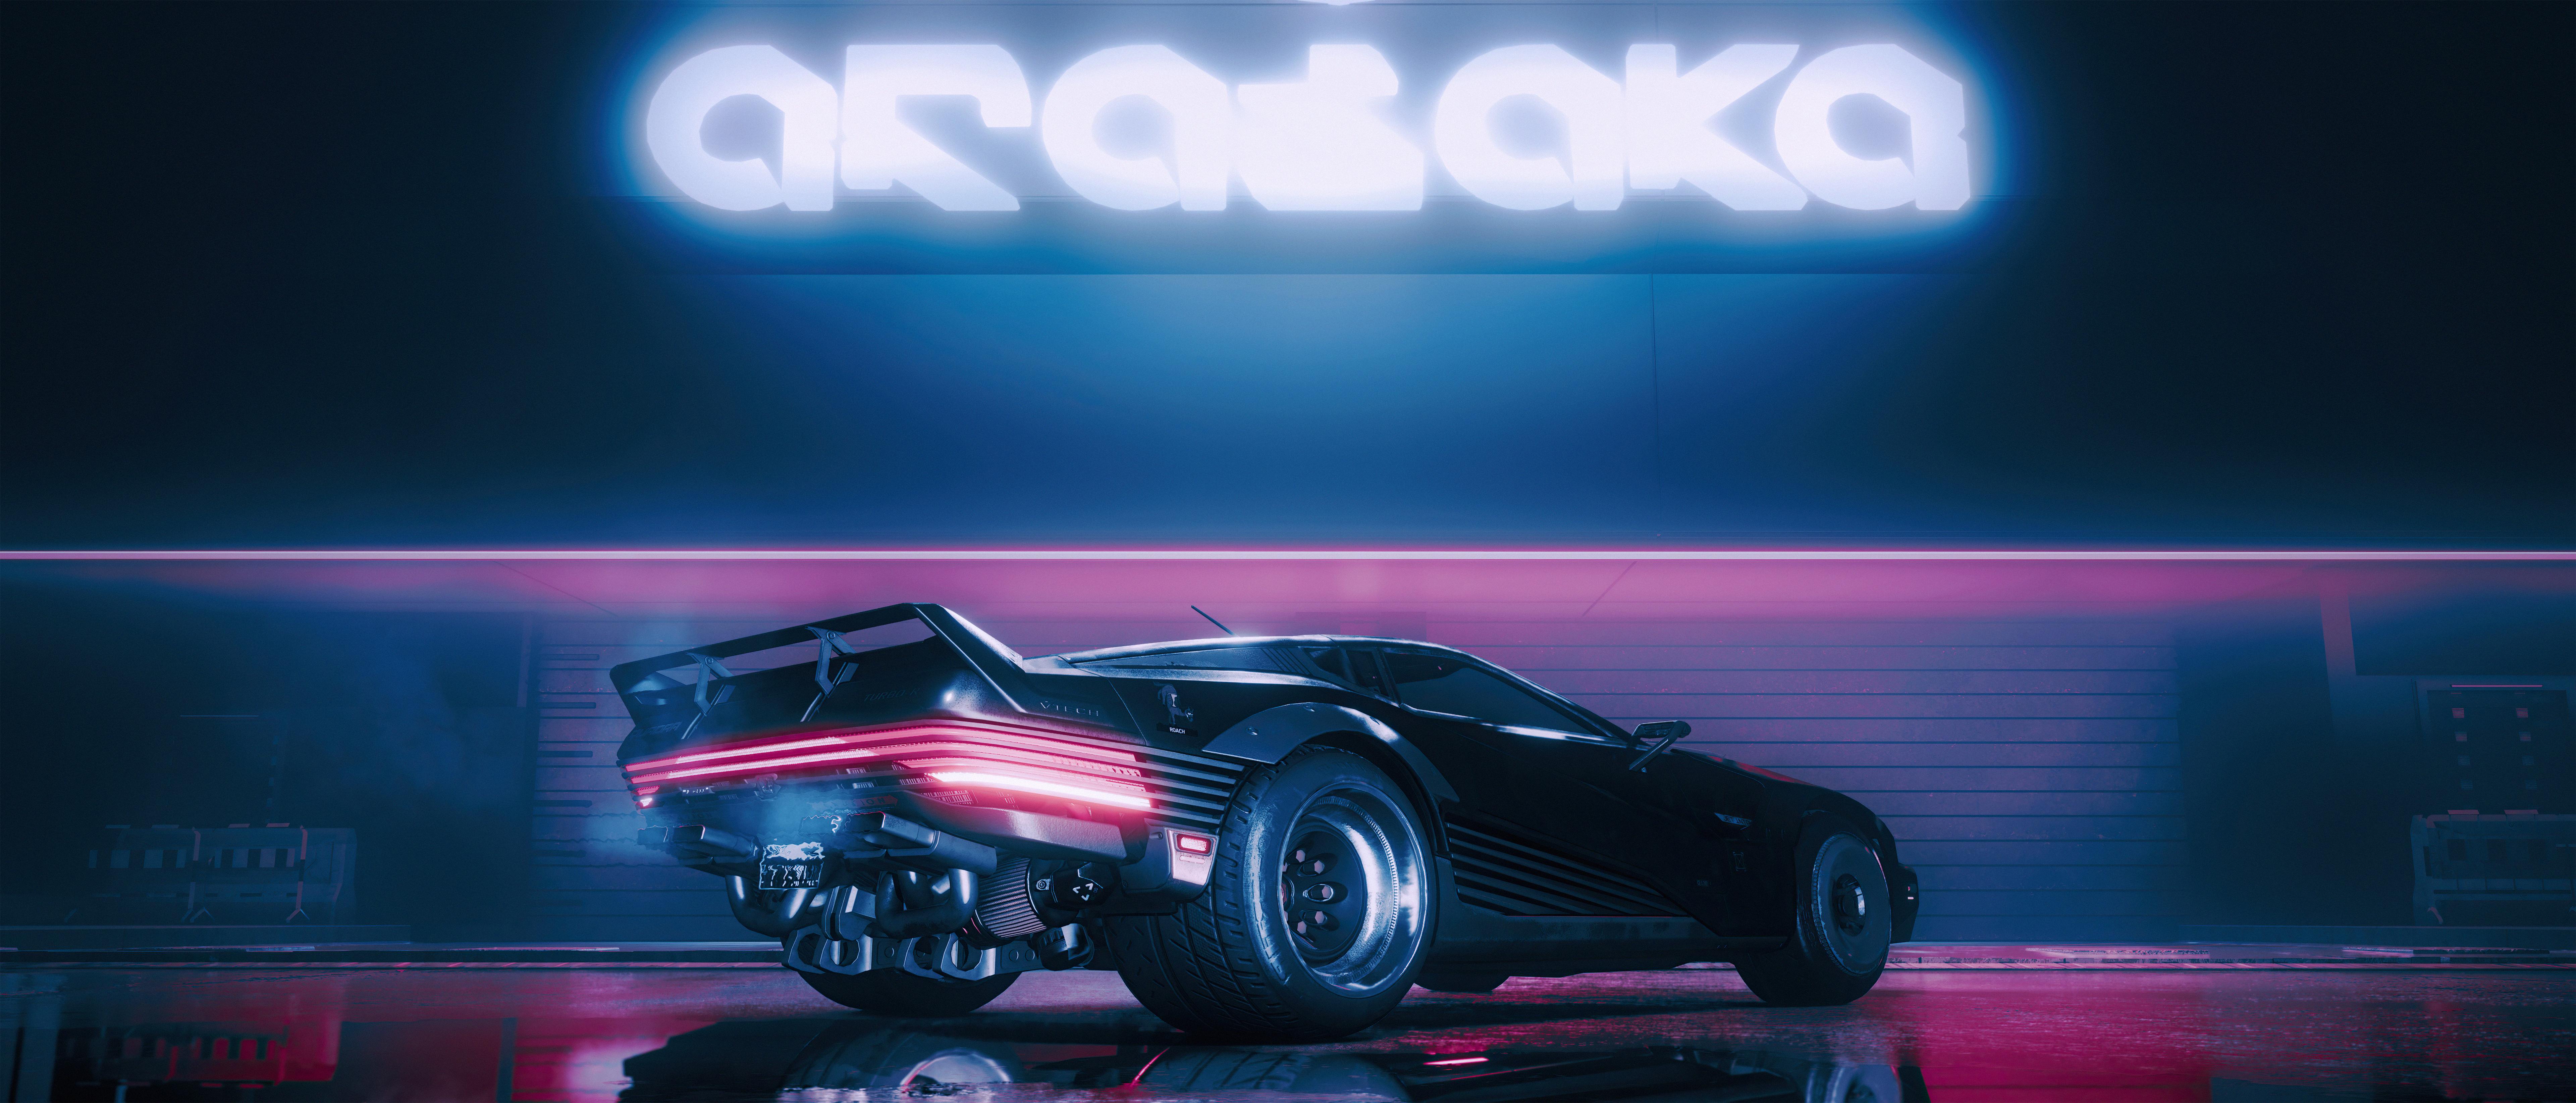 quadra turbo r v tech in cyberpunk 2077 4k 1618136928 - Quadra Turbo R V Tech In Cyberpunk 2077 4k - Quadra Turbo R V Tech In Cyberpunk 2077 4k wallpapers